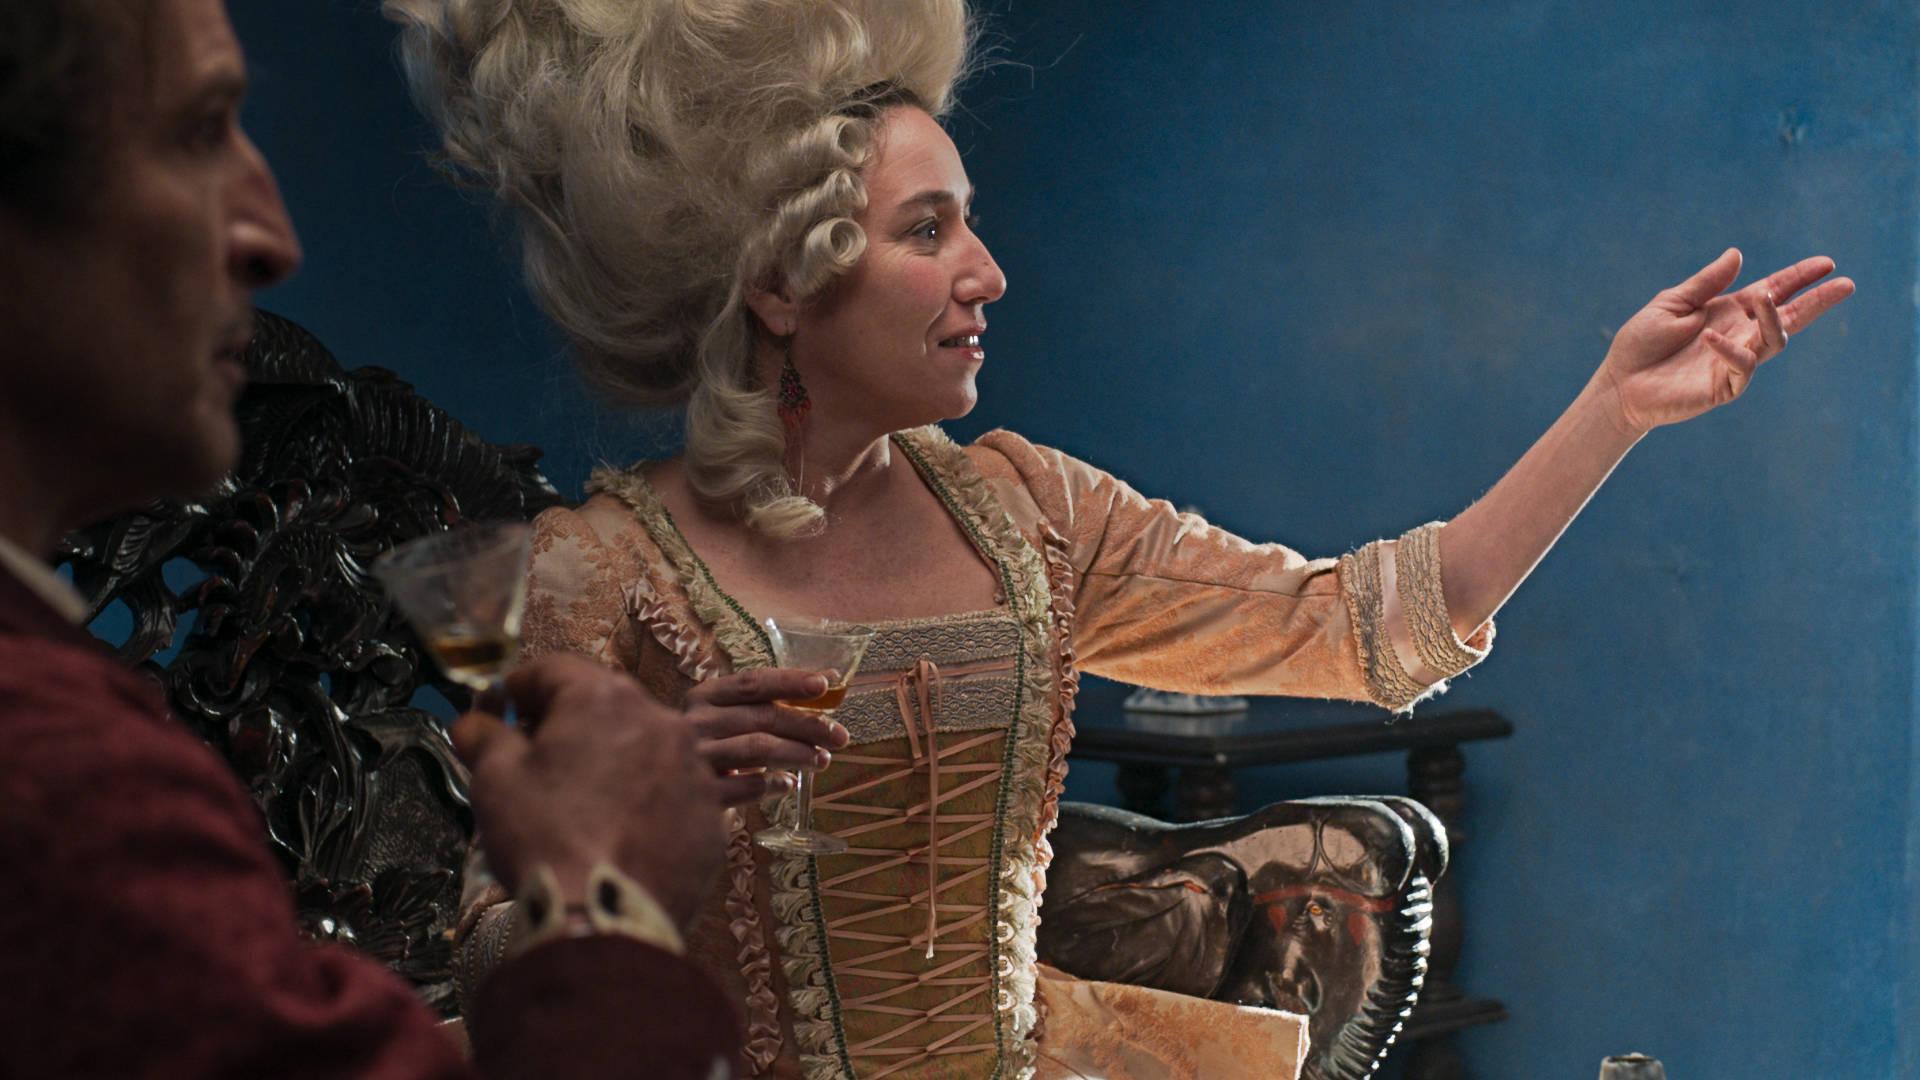 Lola Dueñas as Luciana Piñares de Luenga in Lucrecia Martel's 'Zama.' Strand Releasing